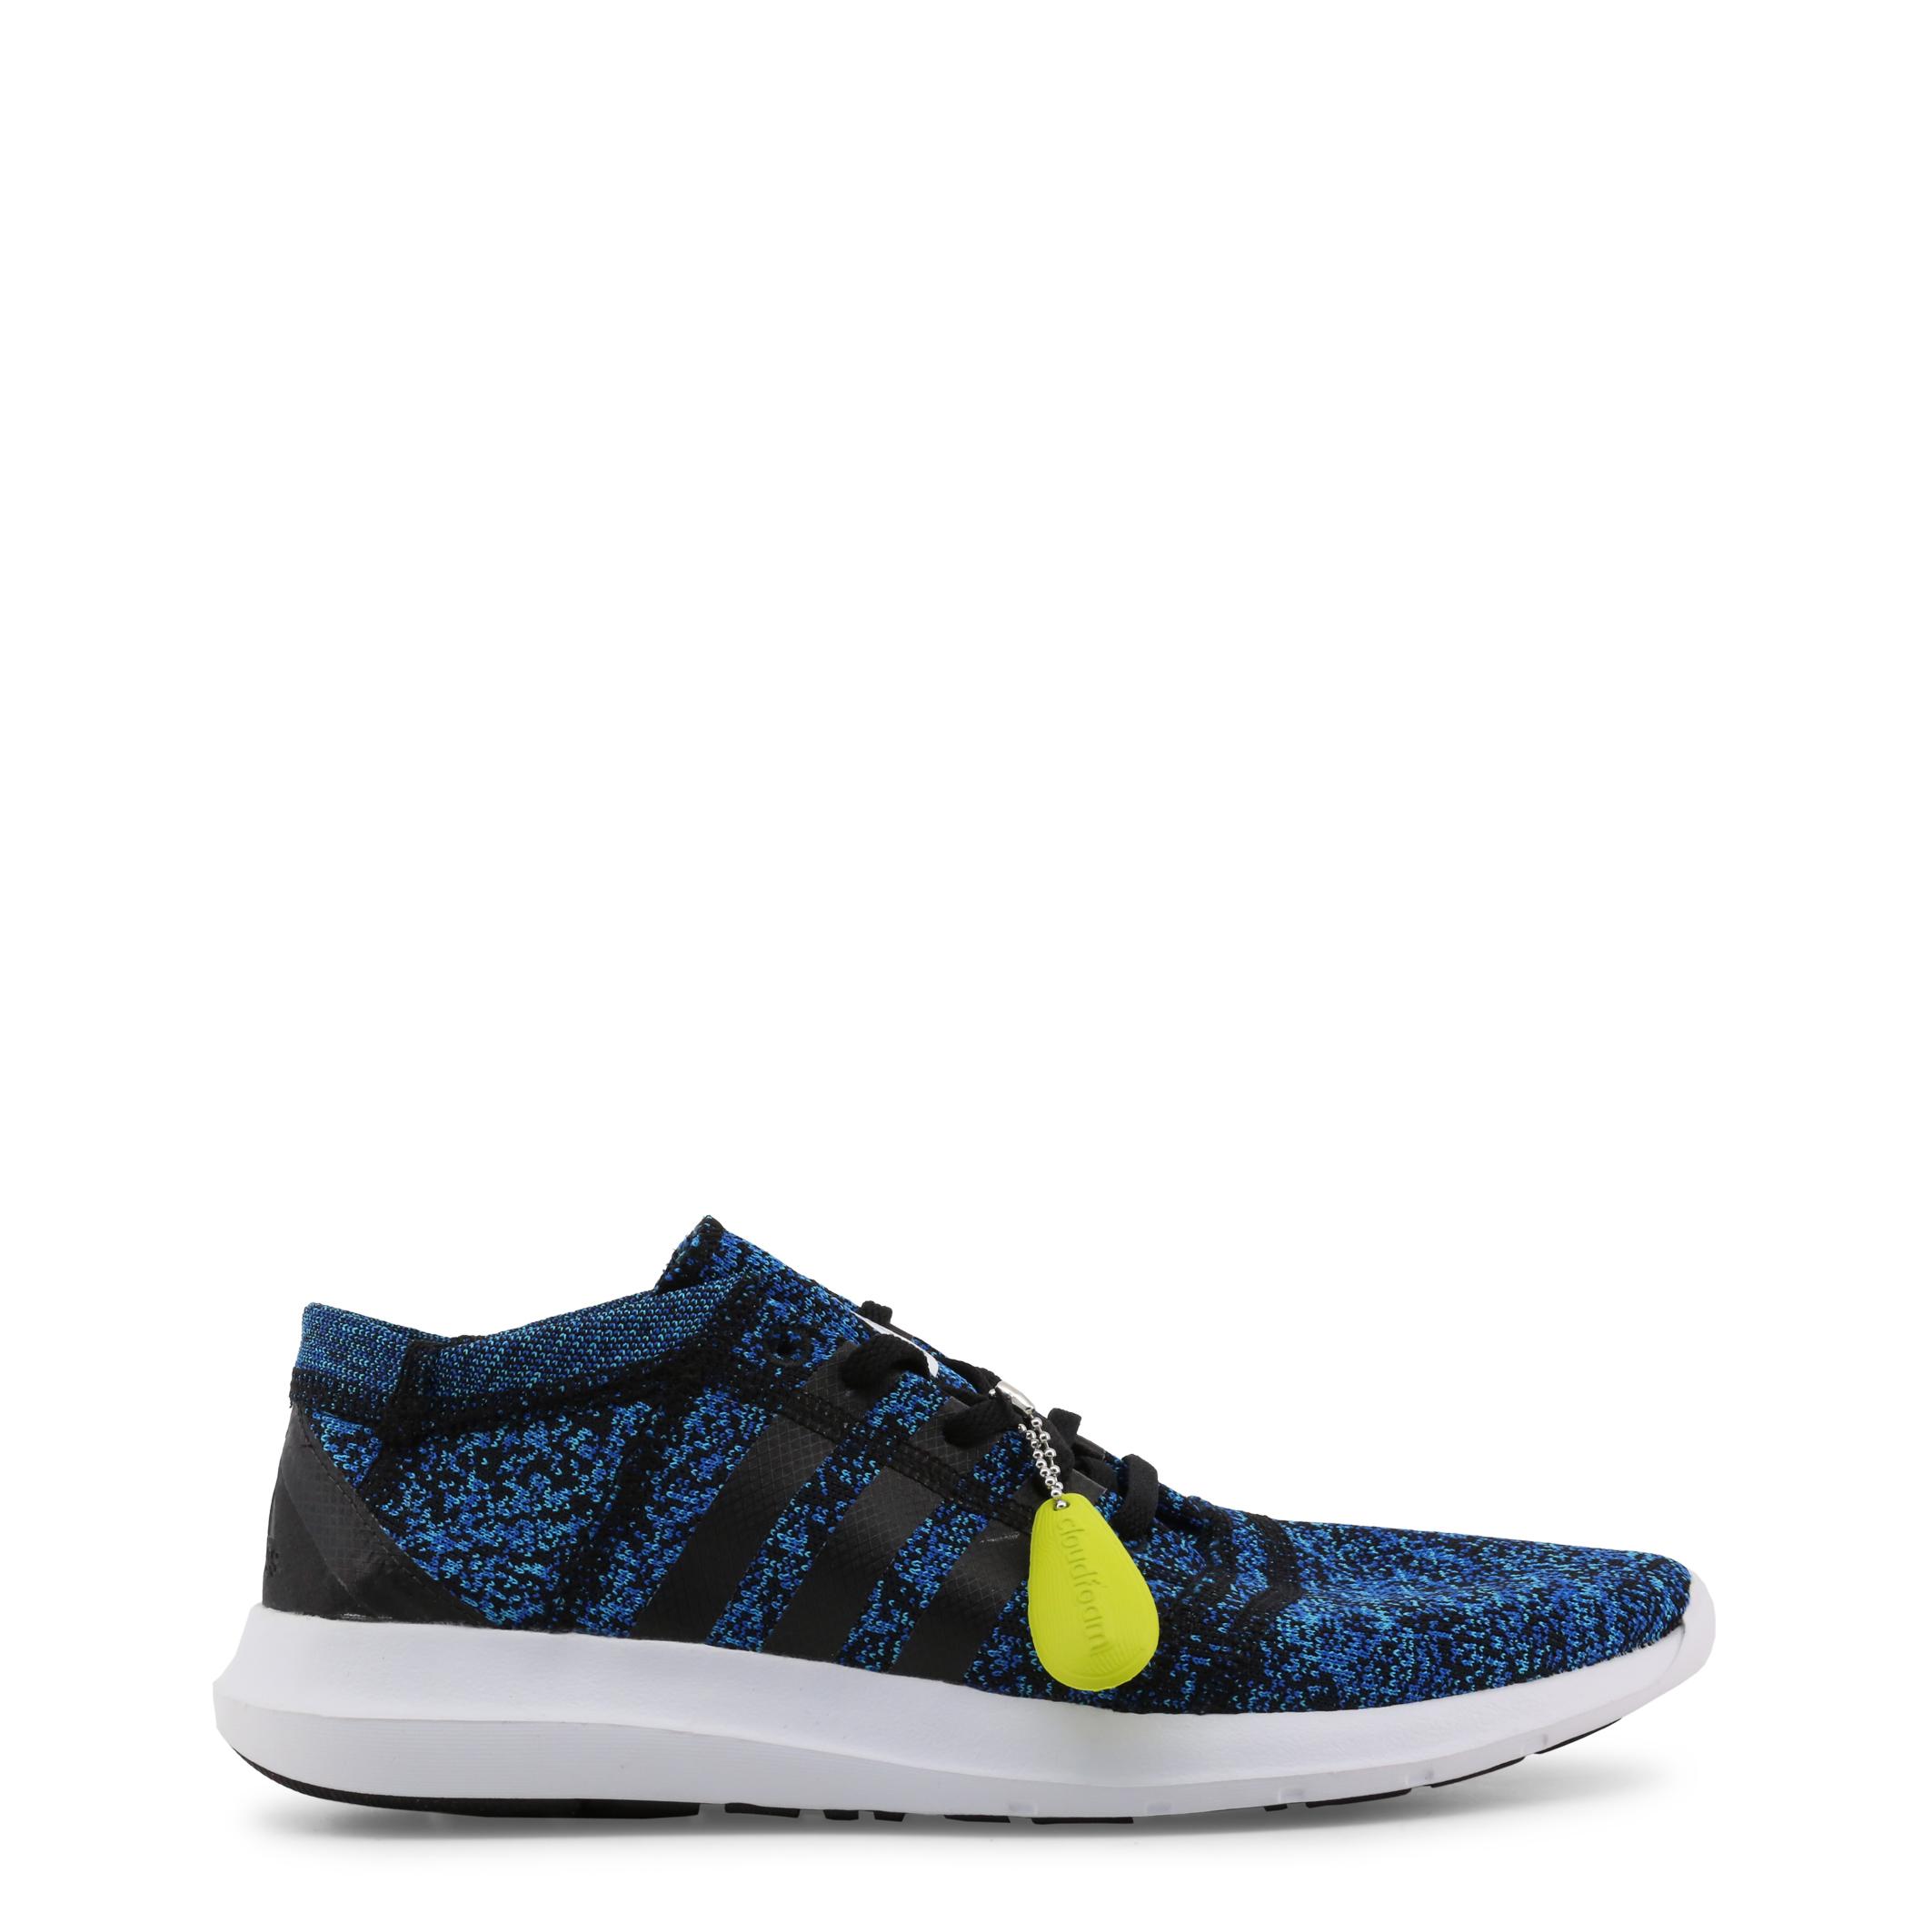 Adidas ELEMENTS REFINE 2